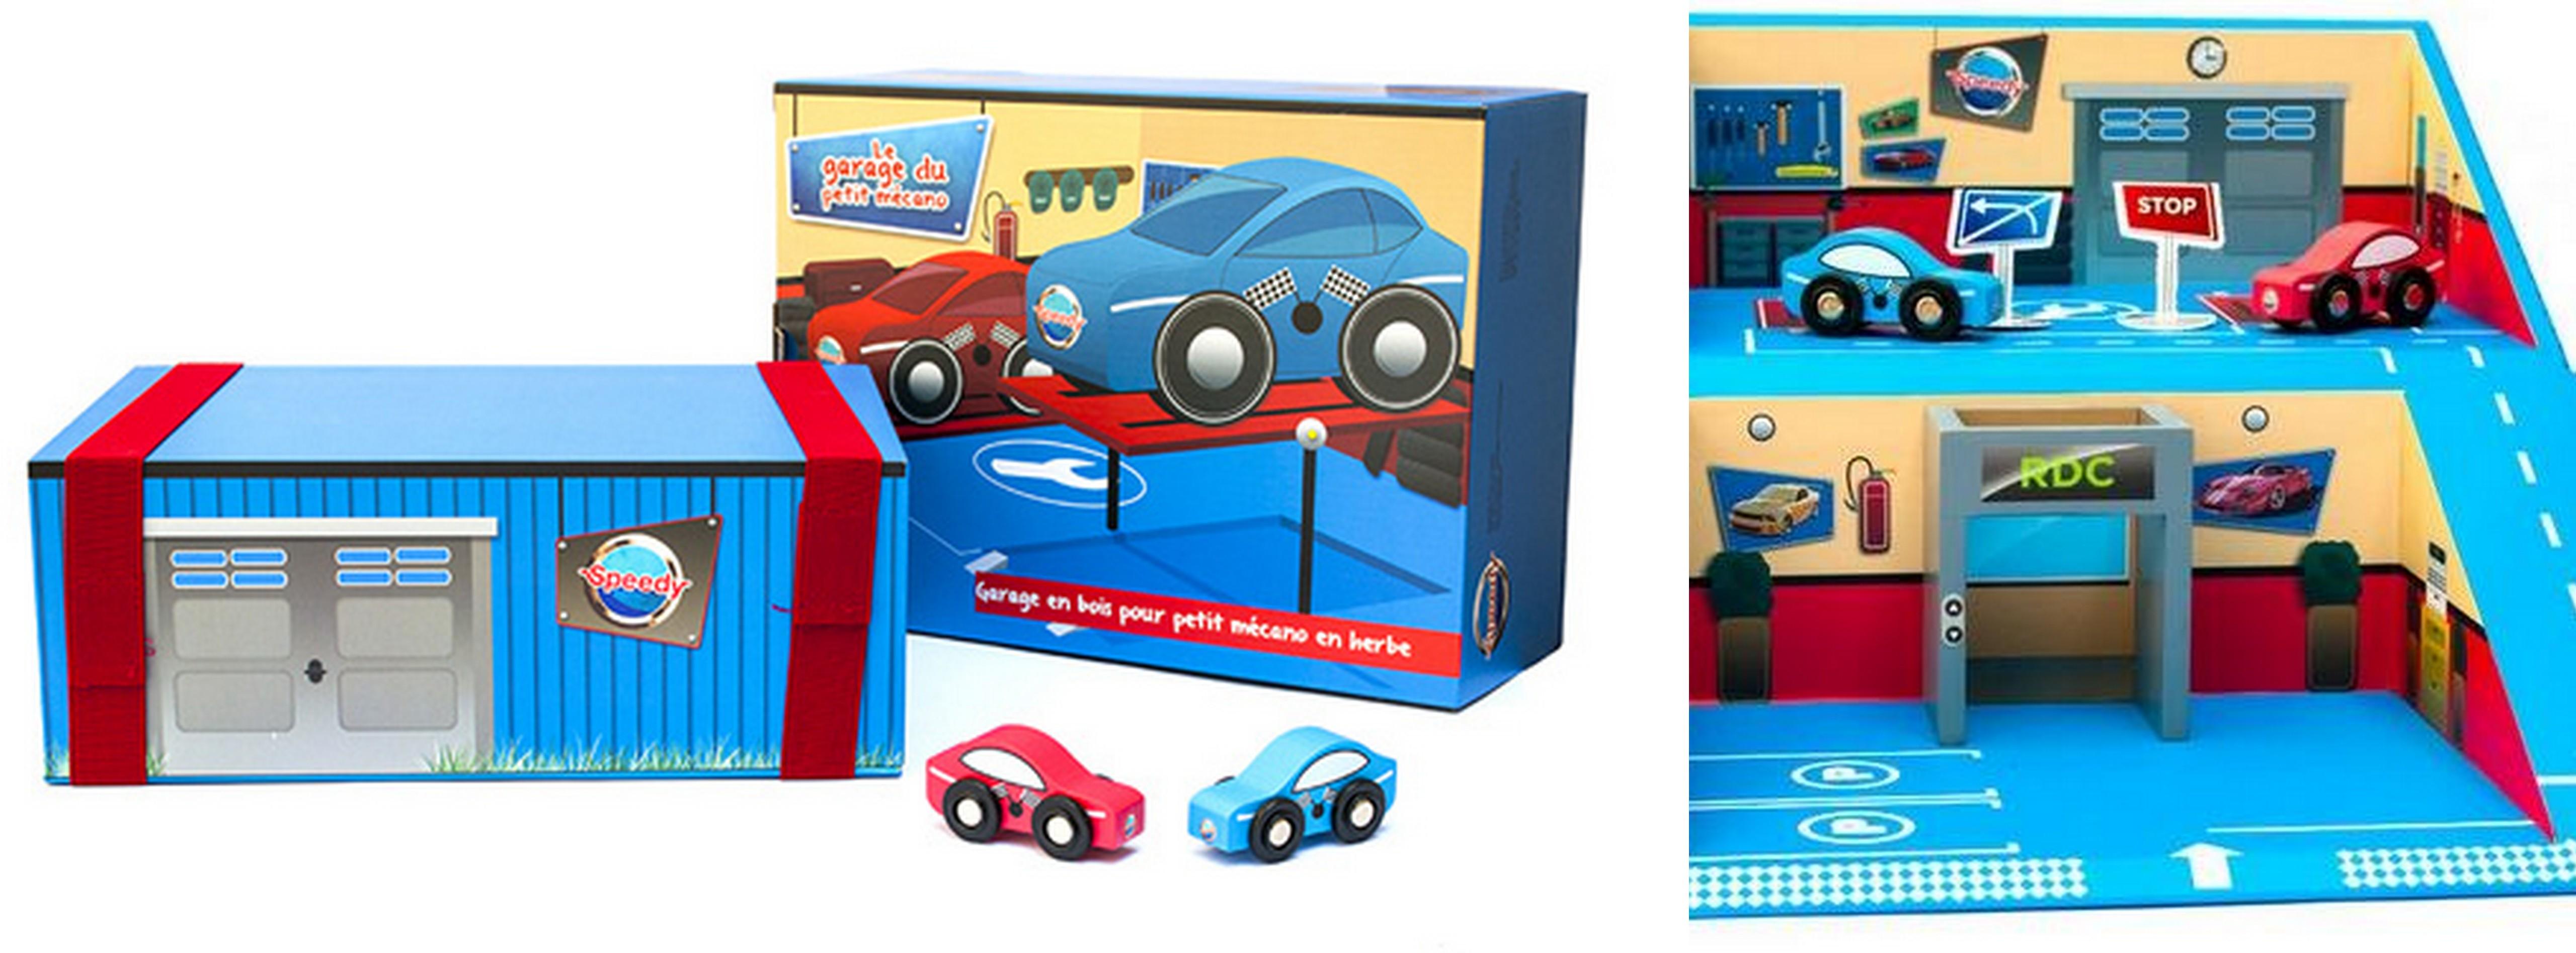 ze vais r parer la voiture dans mon garage en bois speedy flying mama. Black Bedroom Furniture Sets. Home Design Ideas